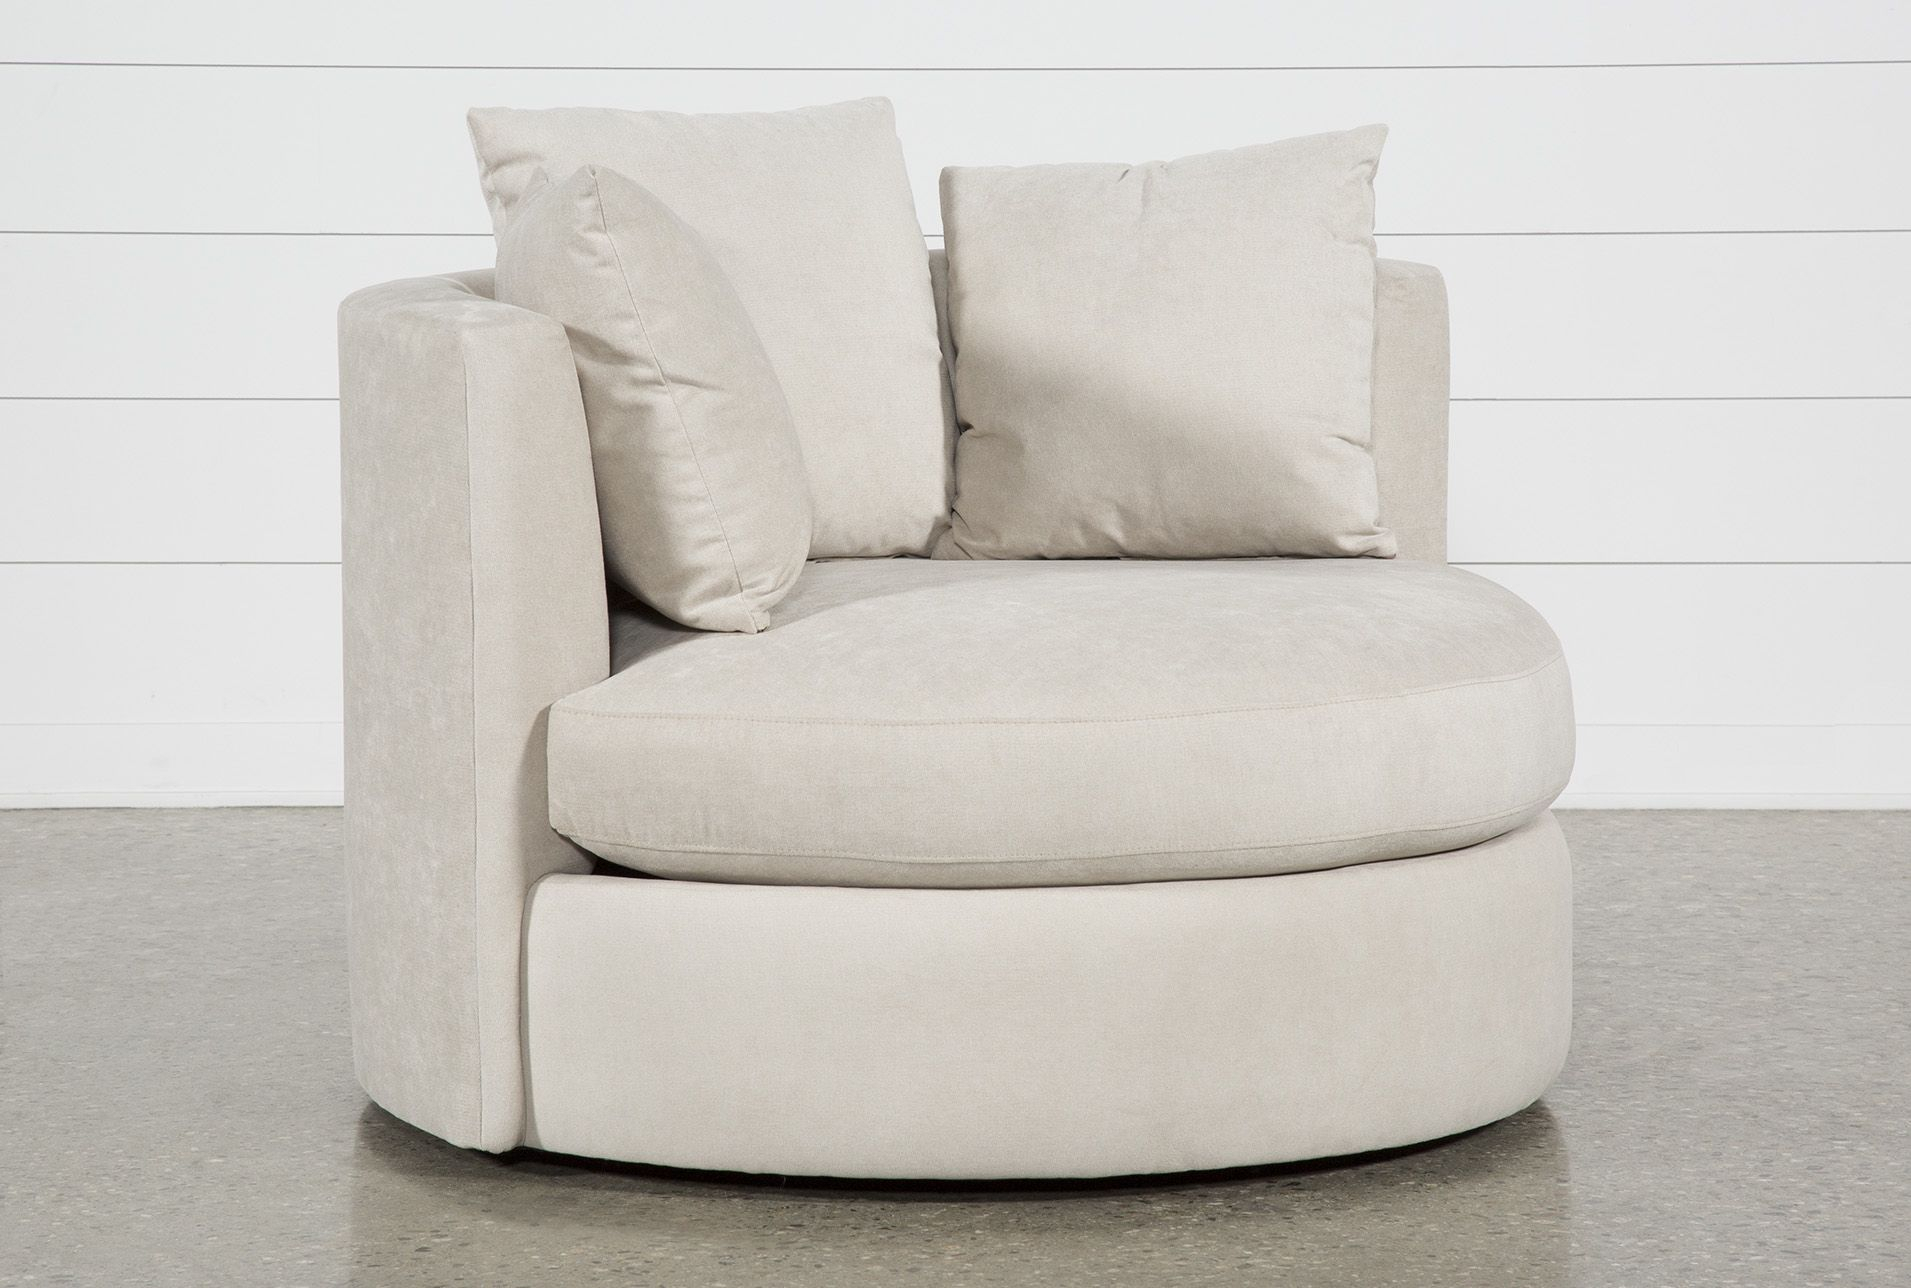 Gibson Ii Swivel Cuddler In 2020 | Cuddler Chair, Big Throughout Cuddler Swivel Sofa Chairs (View 1 of 15)